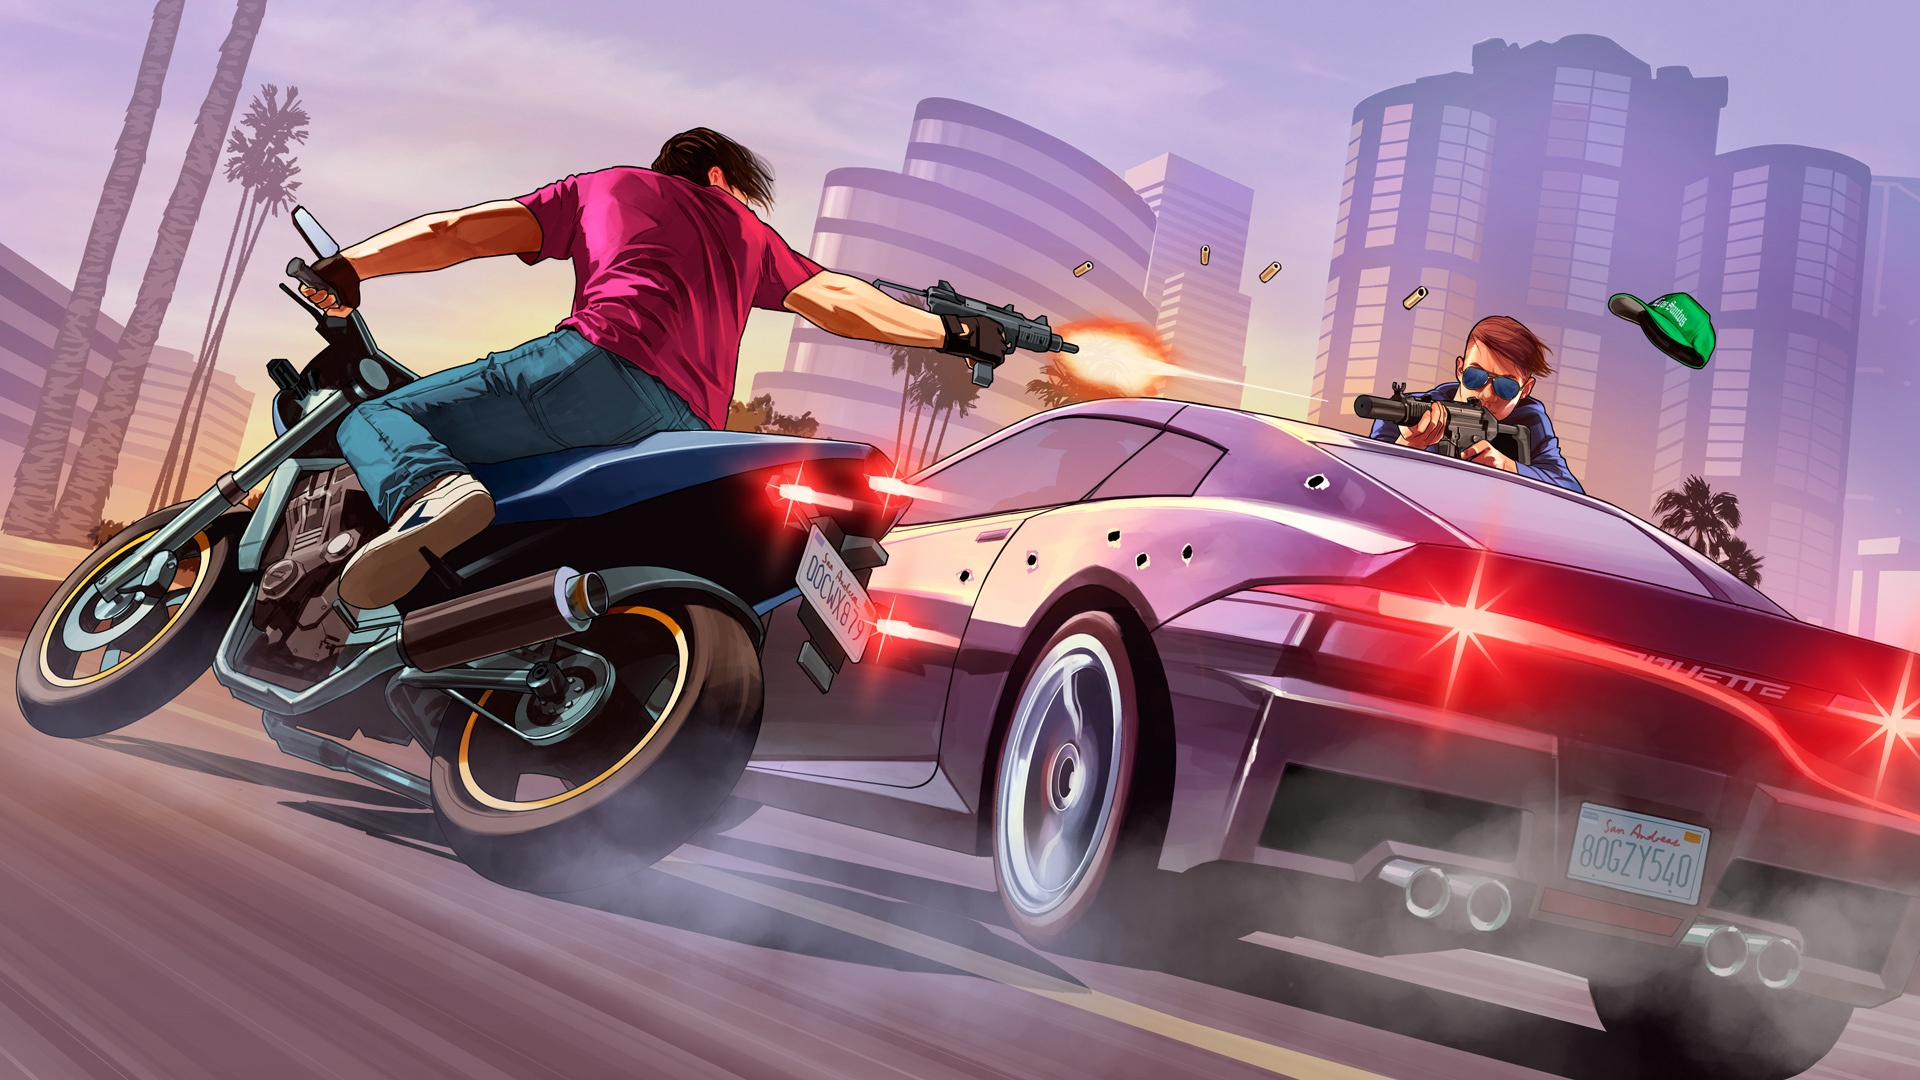 Grand Theft Auto V GTA 5 Video Game HD Wallpaper   Stylish HD 1920x1080